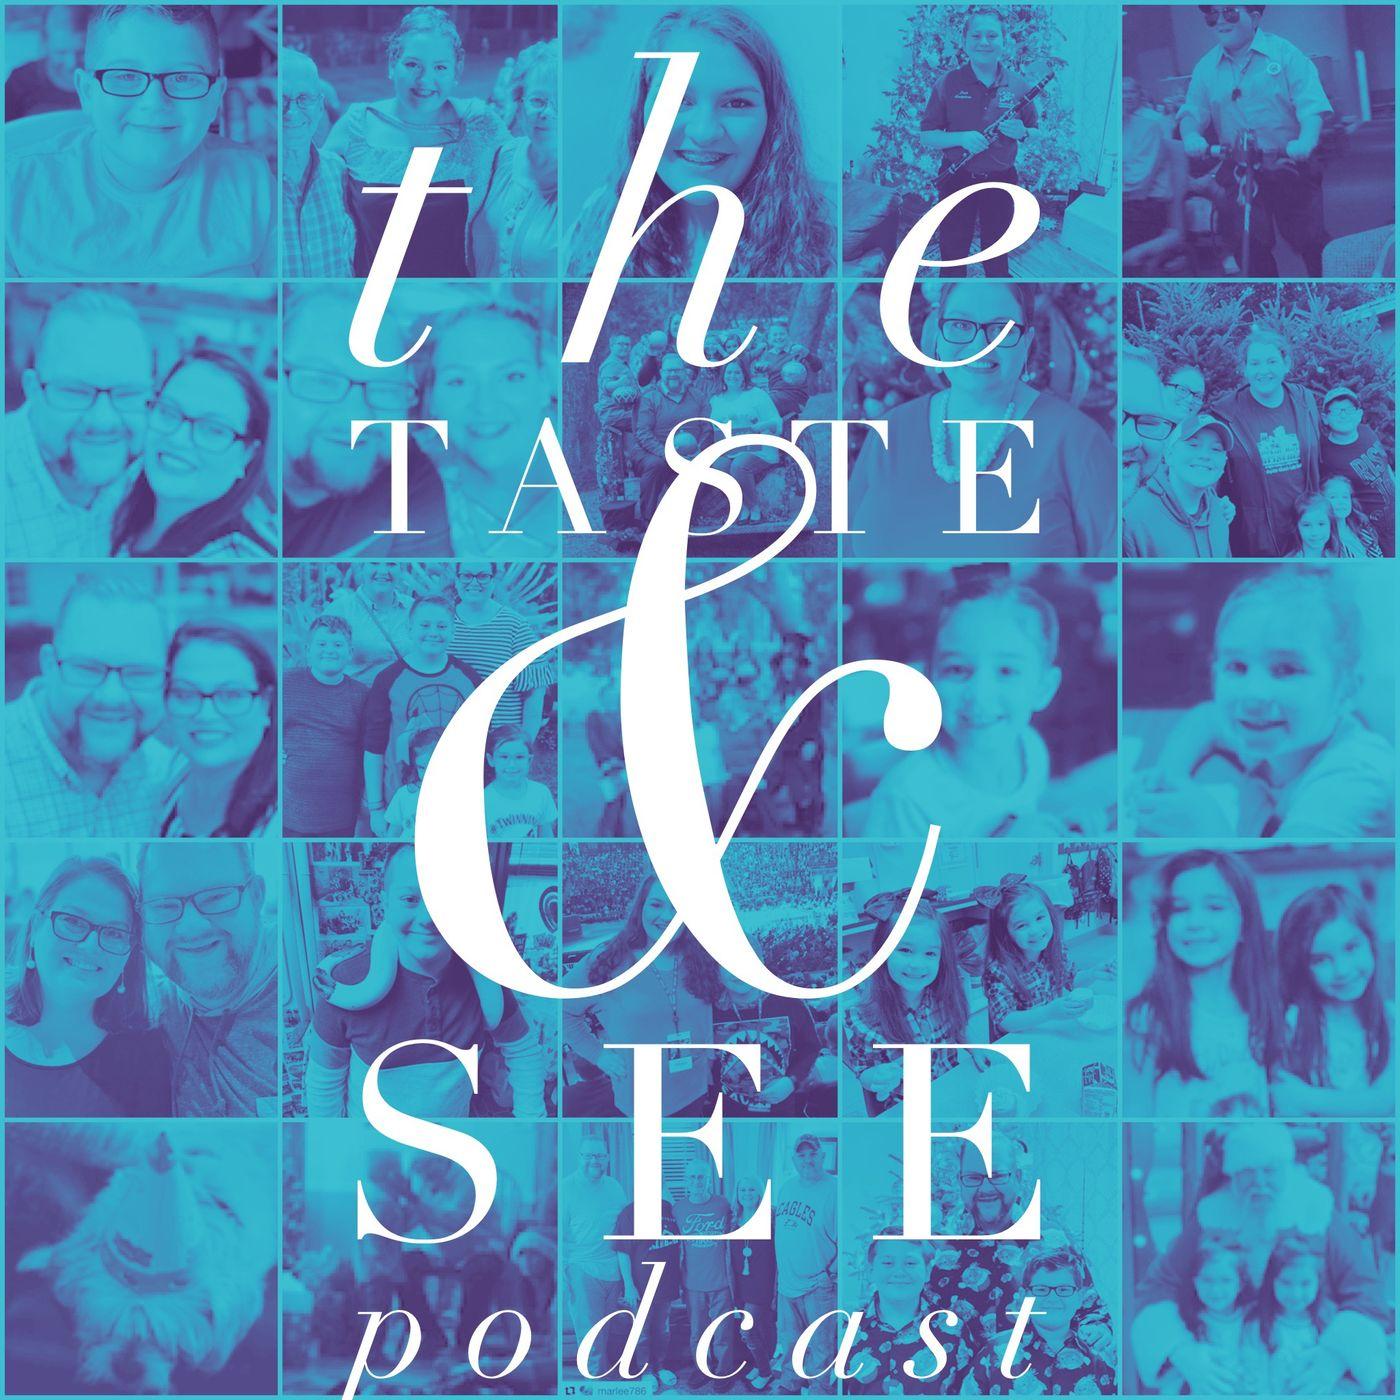 011: The Disciple-Making Parent